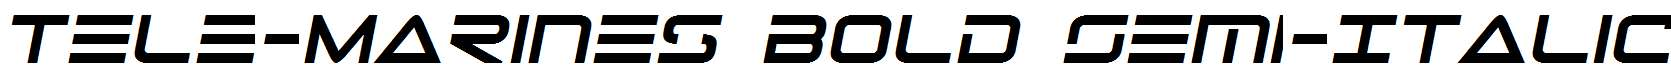 Tele-Marines-Bold-Semi-Italic